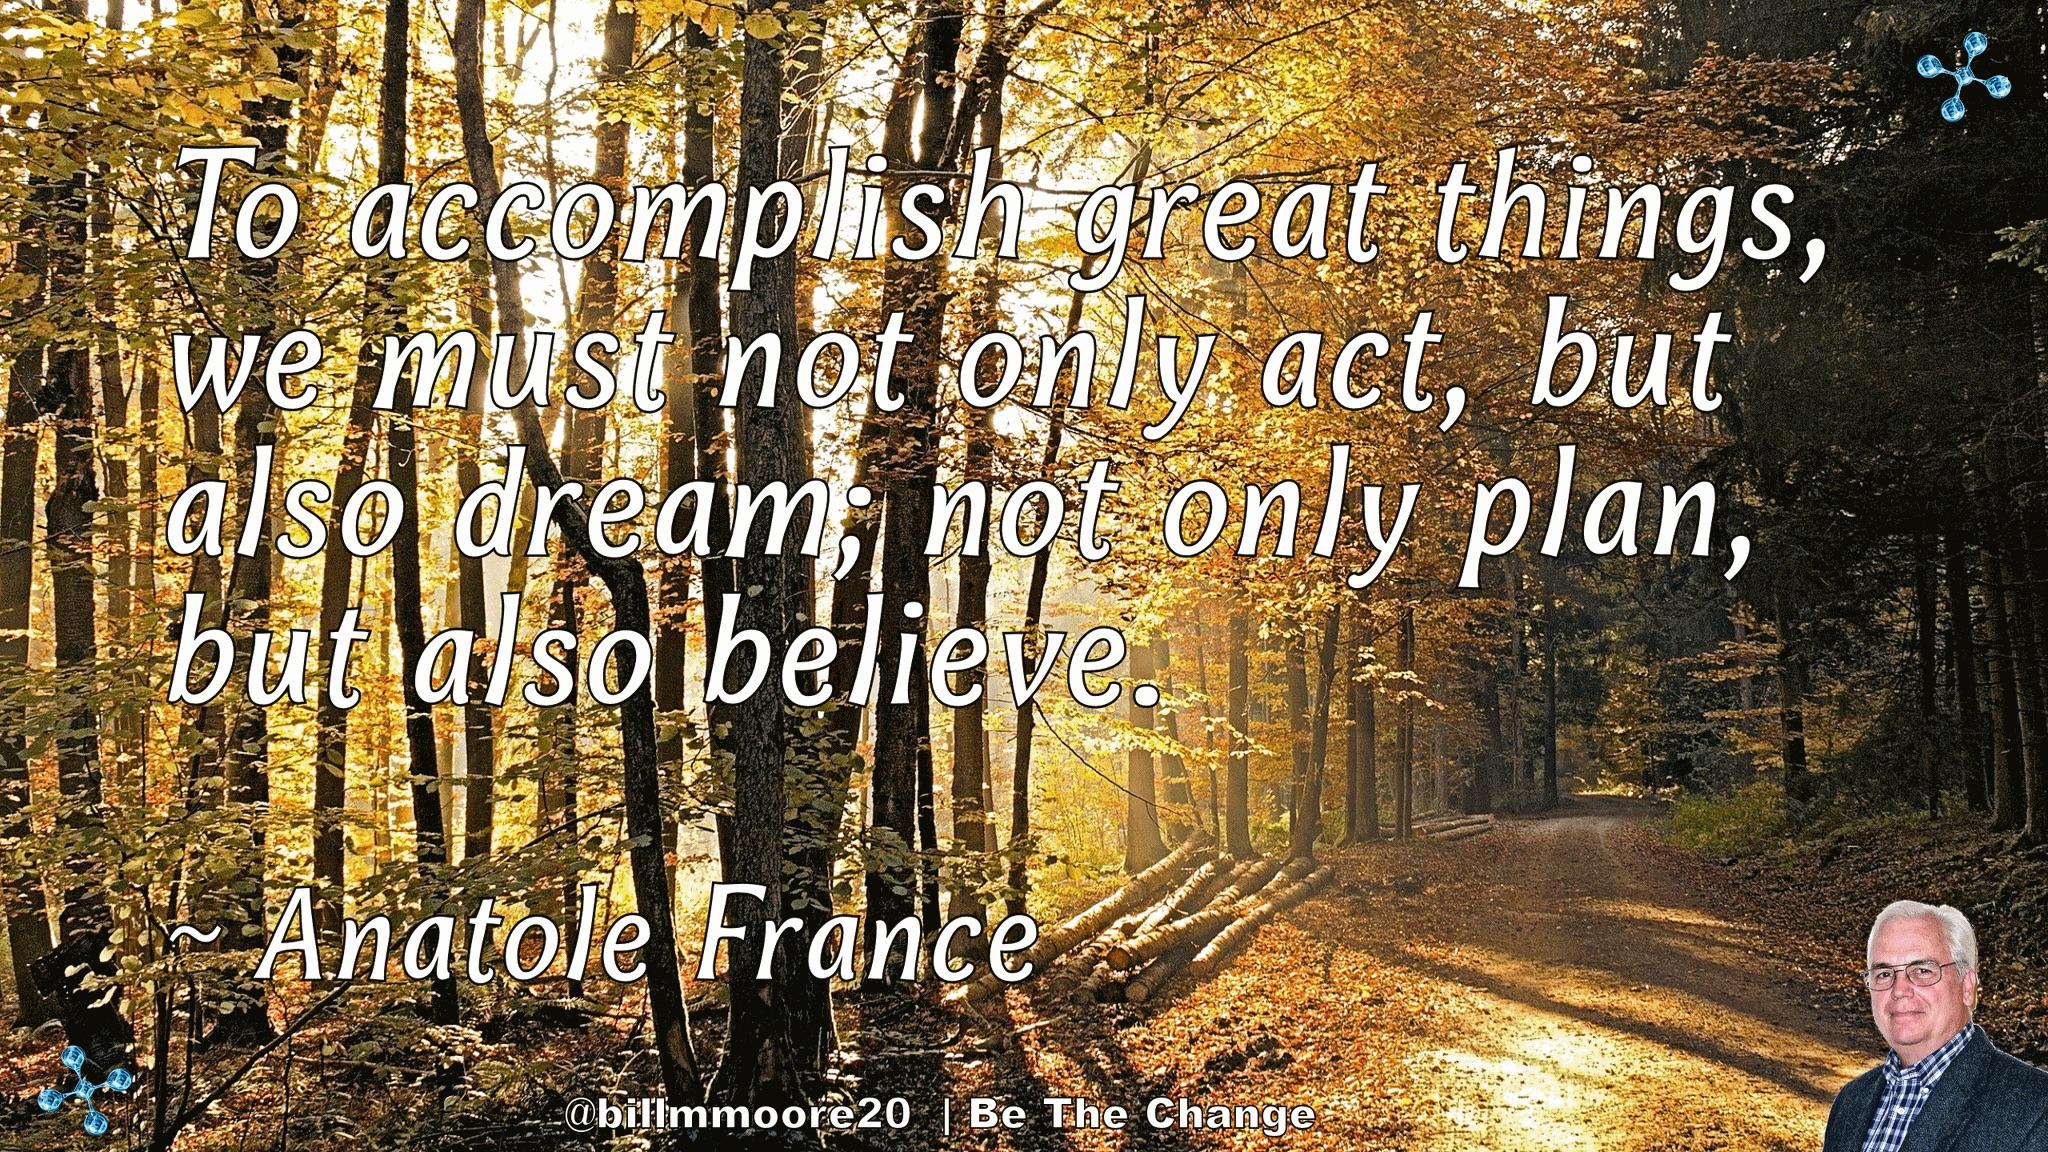 Accomplish Great Things